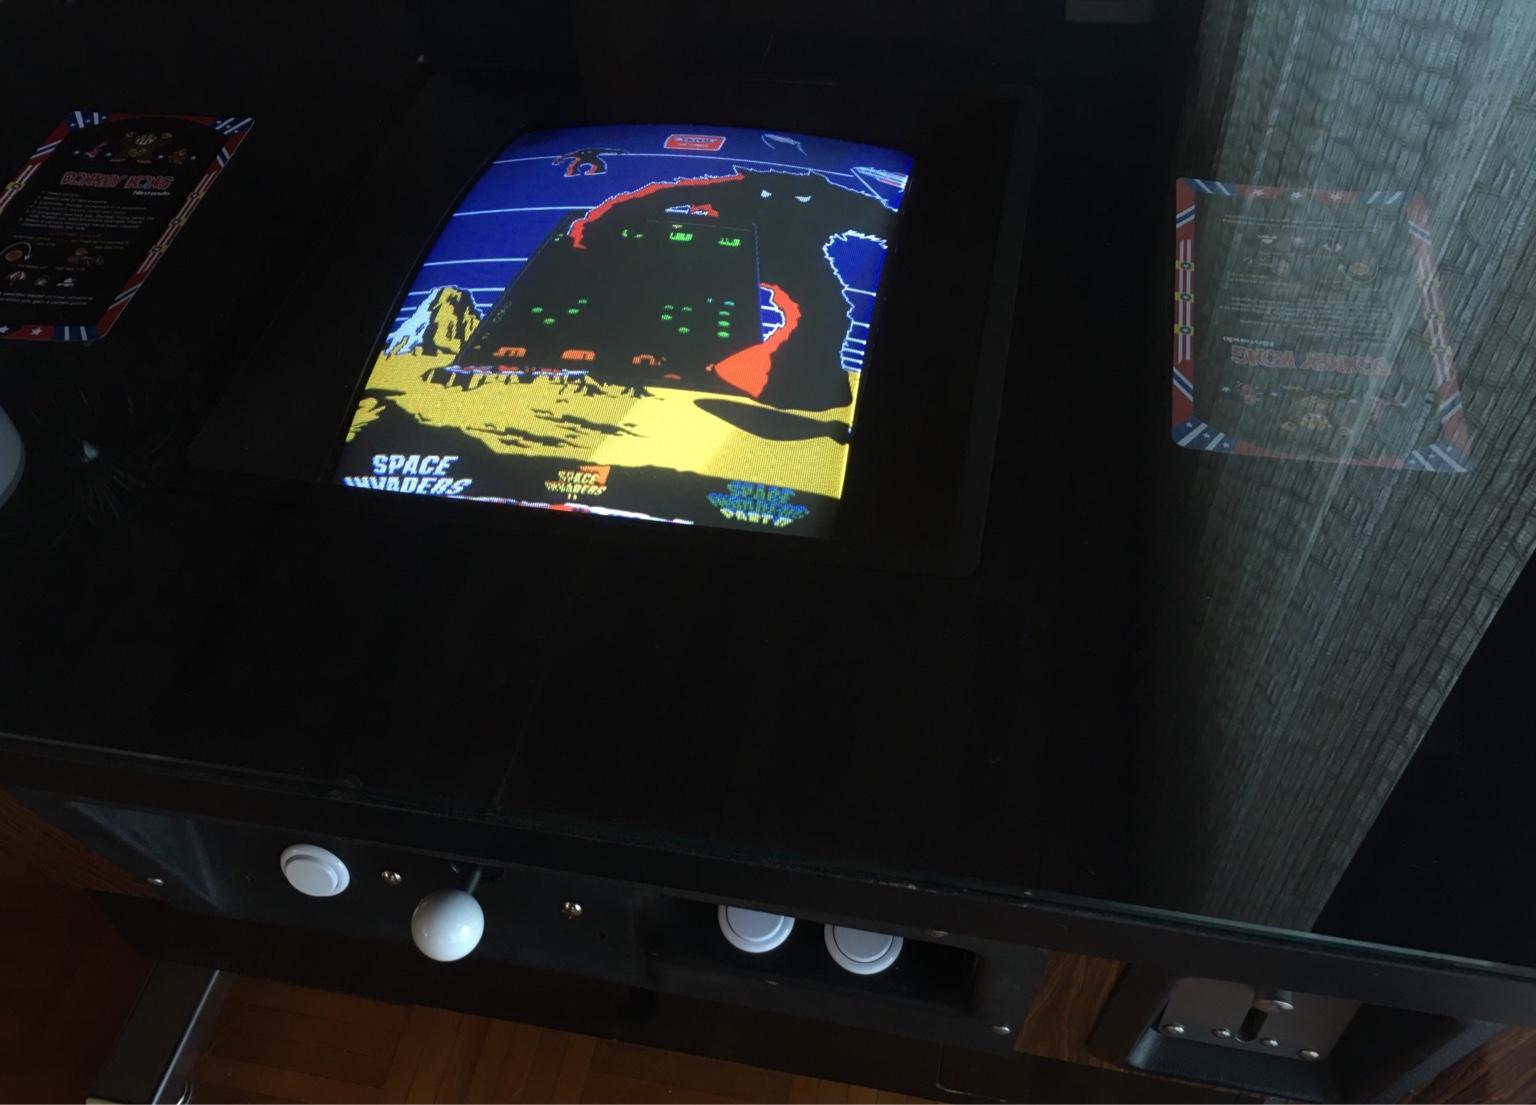 JAMMA board from Raspberry PI [Archive] - Page 6 - Aussie Arcade